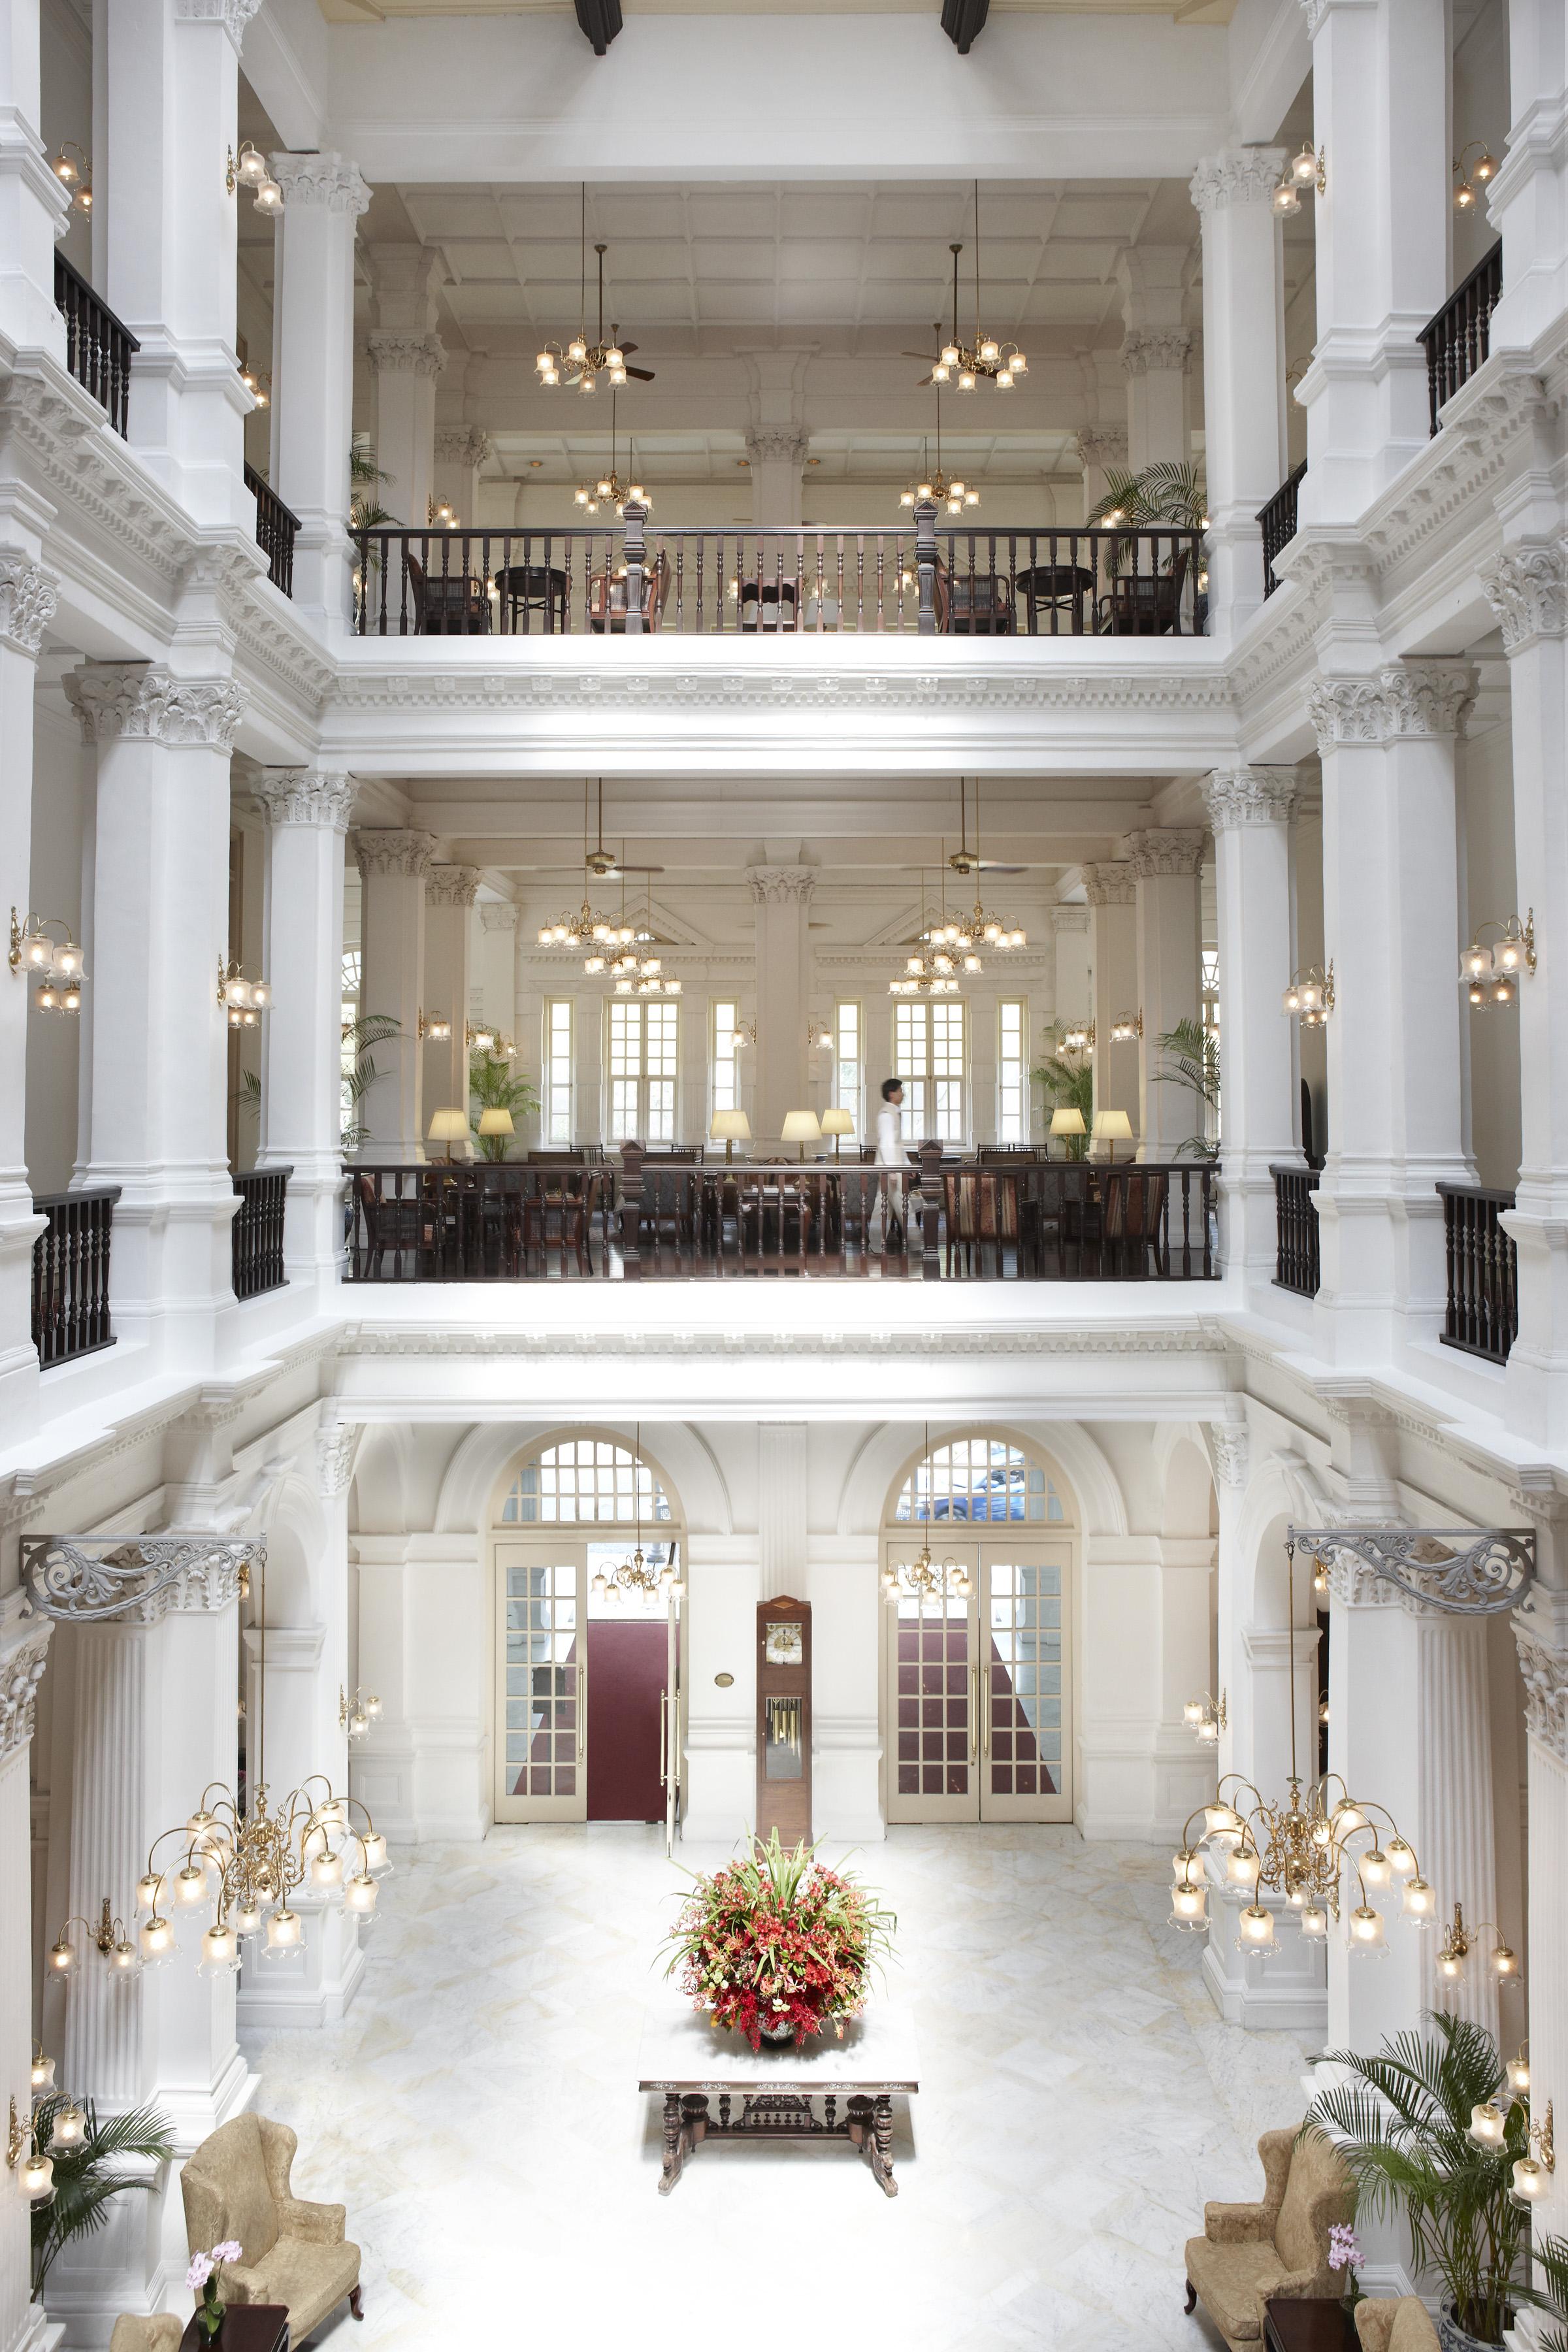 Hi_RHS_47594777_Raffles_Hotel_Singapore_-__Lobby_3